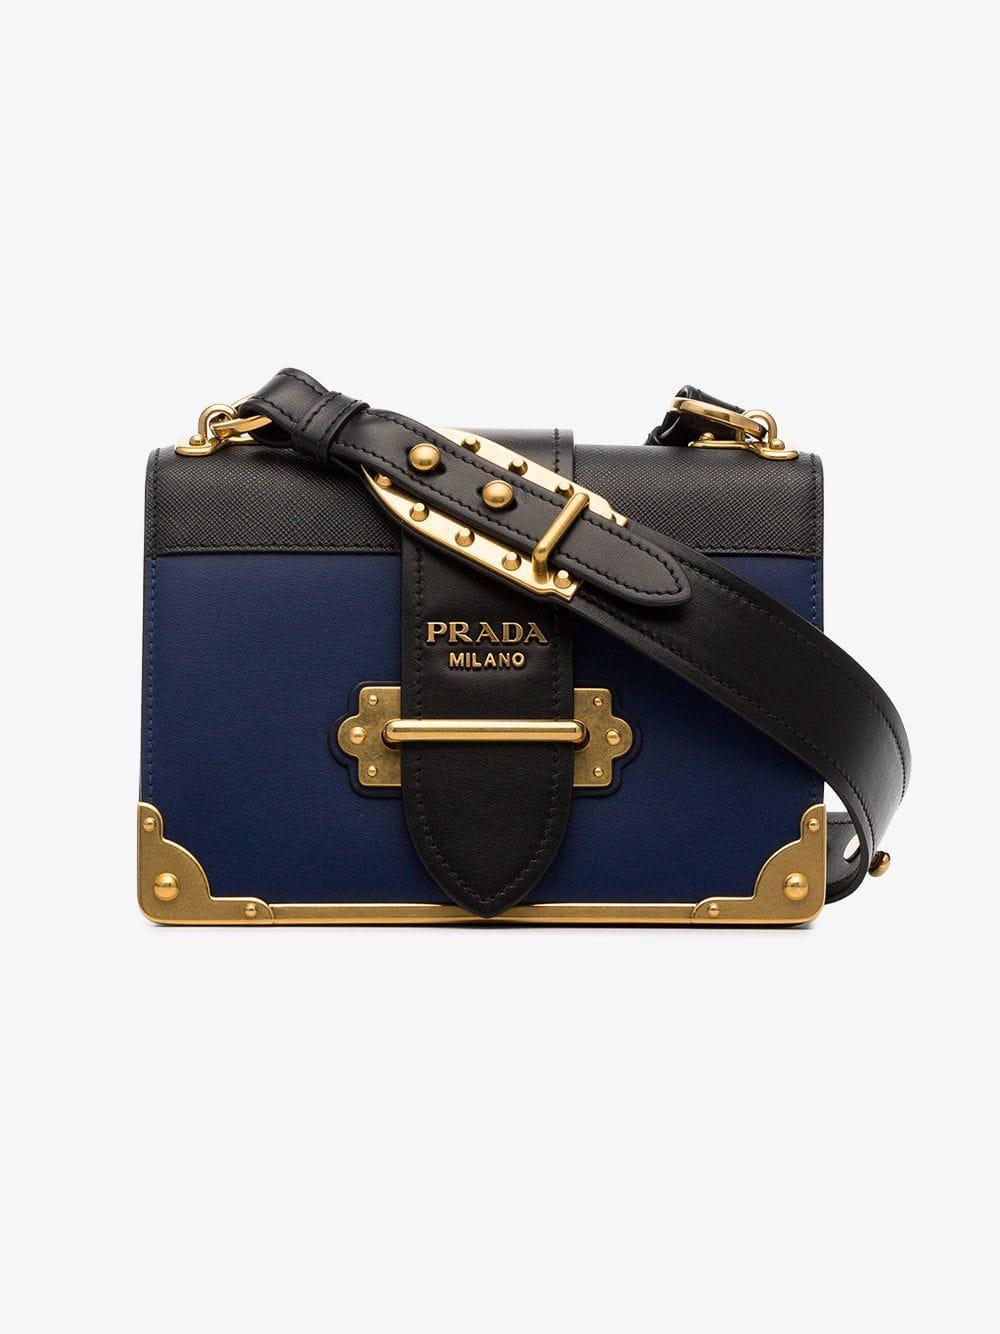 Lyst - Prada Cahier Leather Shoulder Bag in Blue 8e55ba3e27996